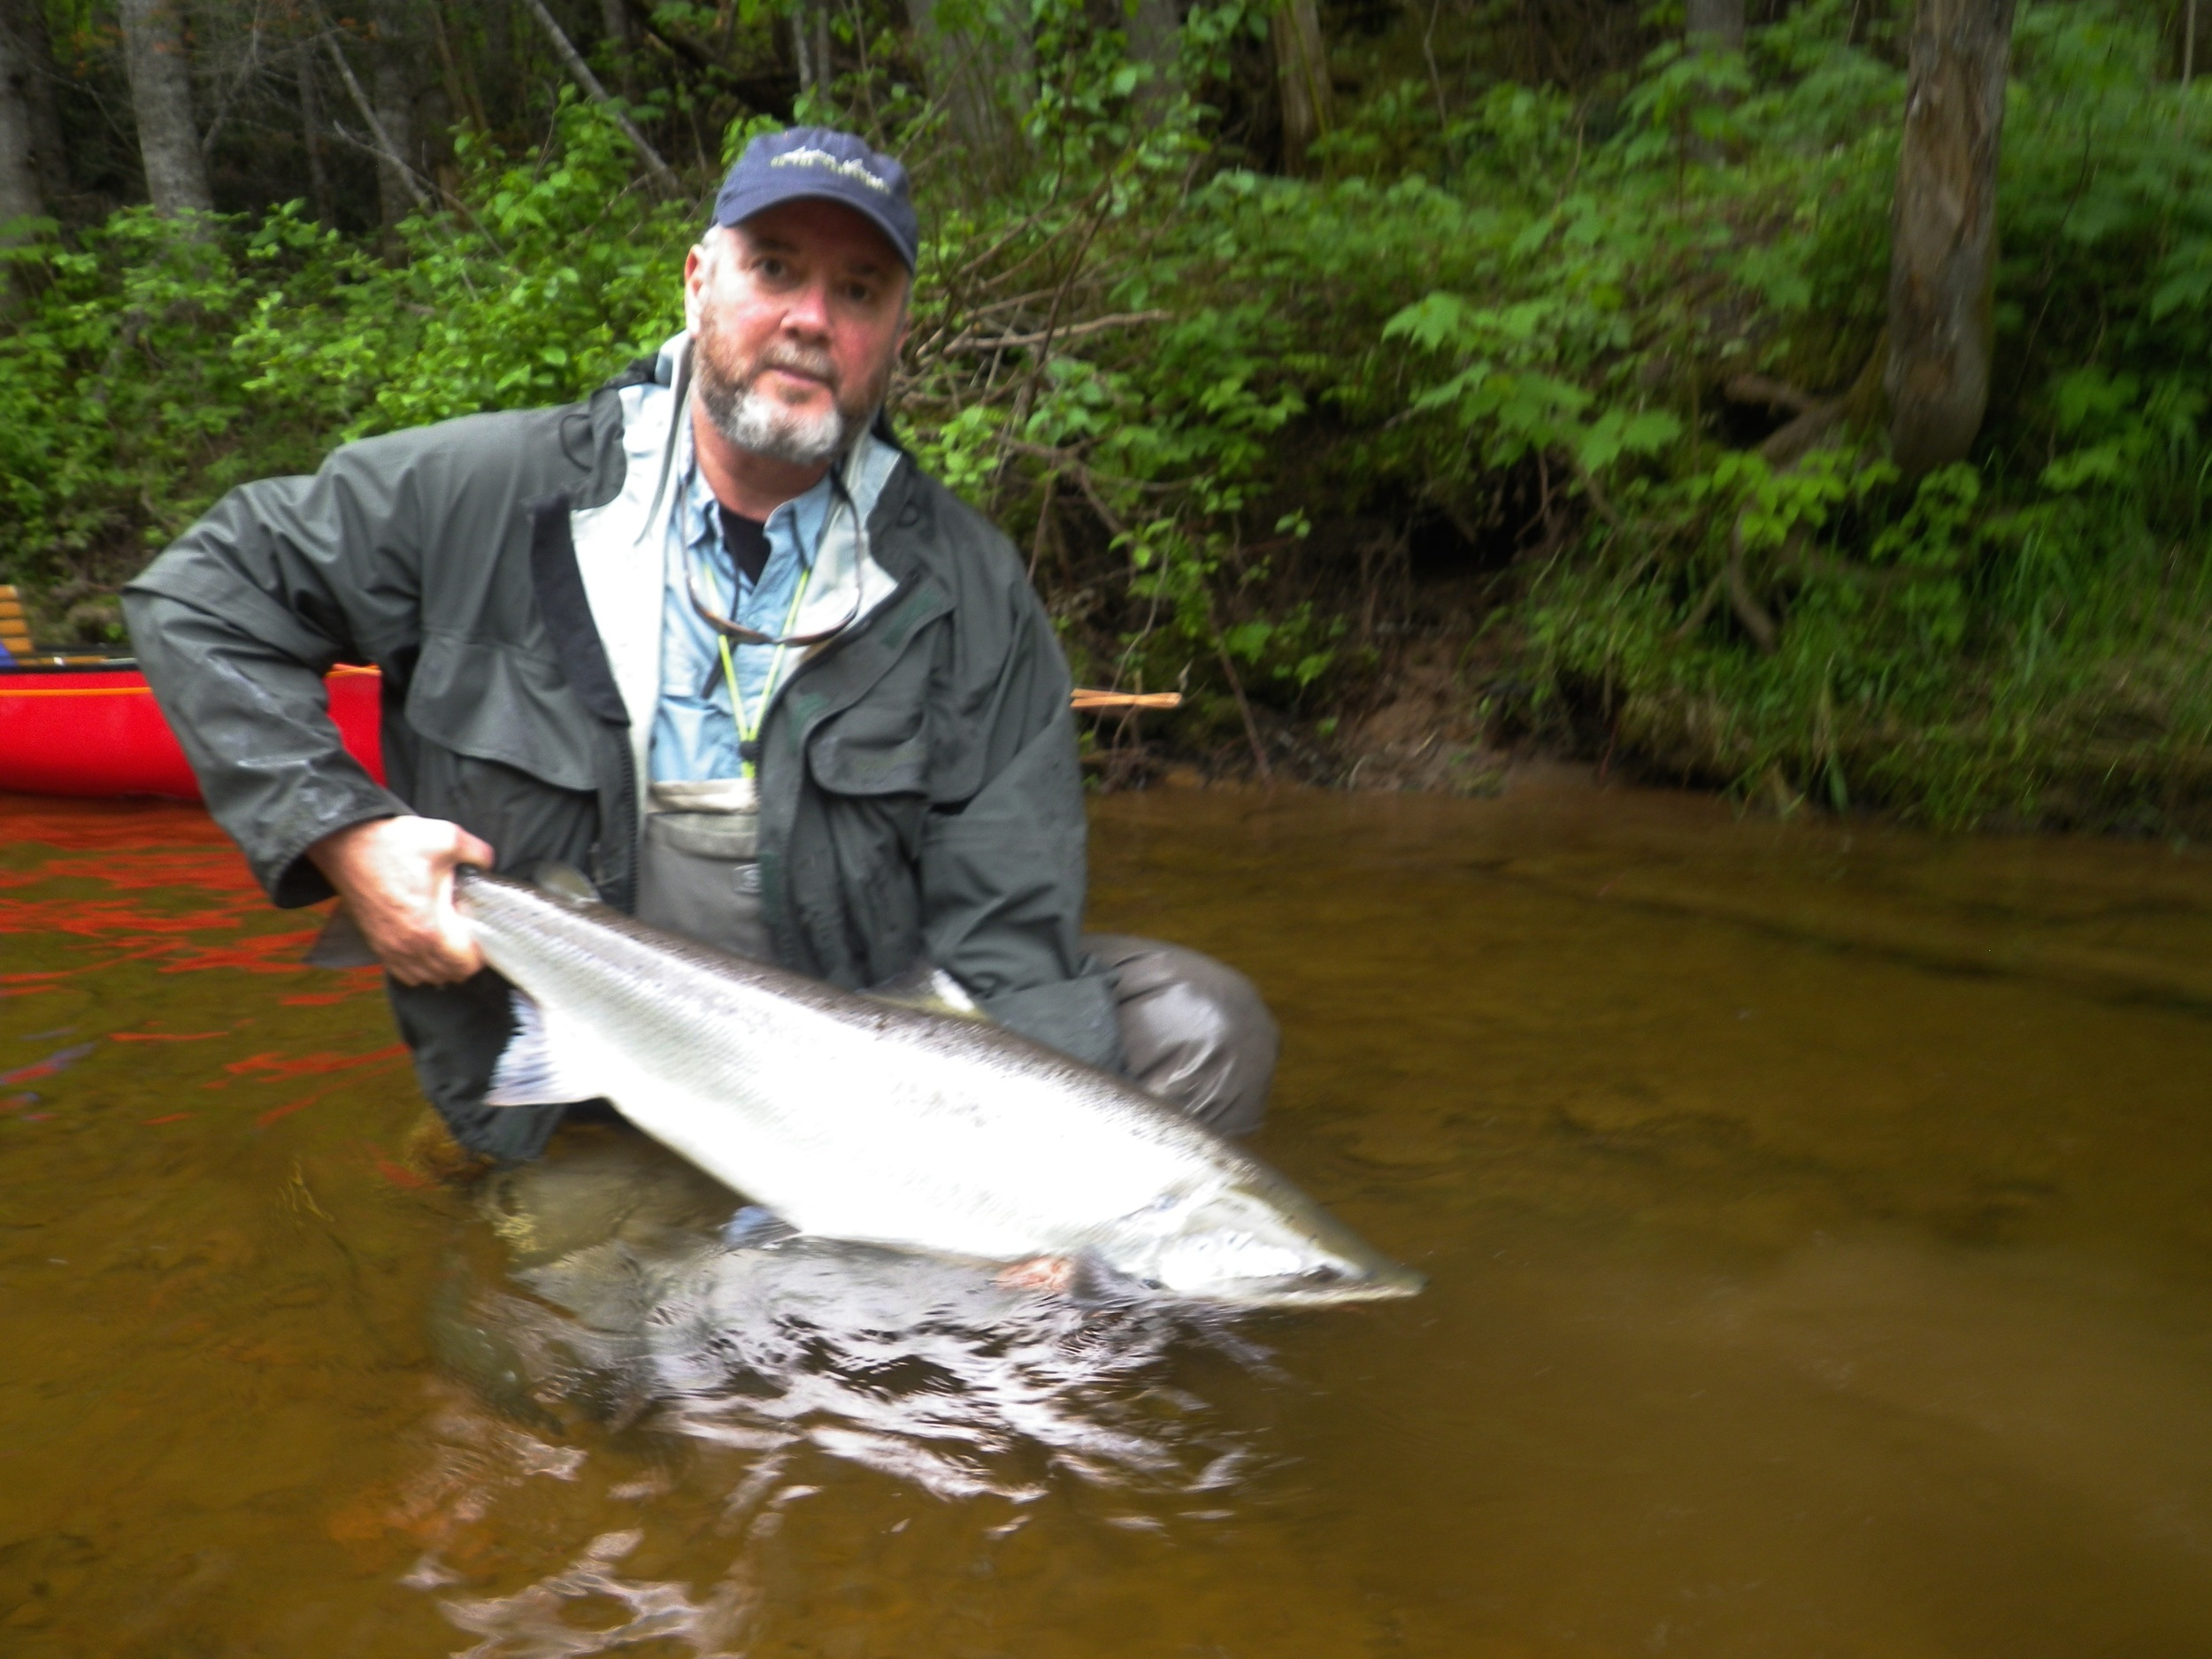 Salmon Lodge Regular David Kent with his first fish of 2016, nice one David!